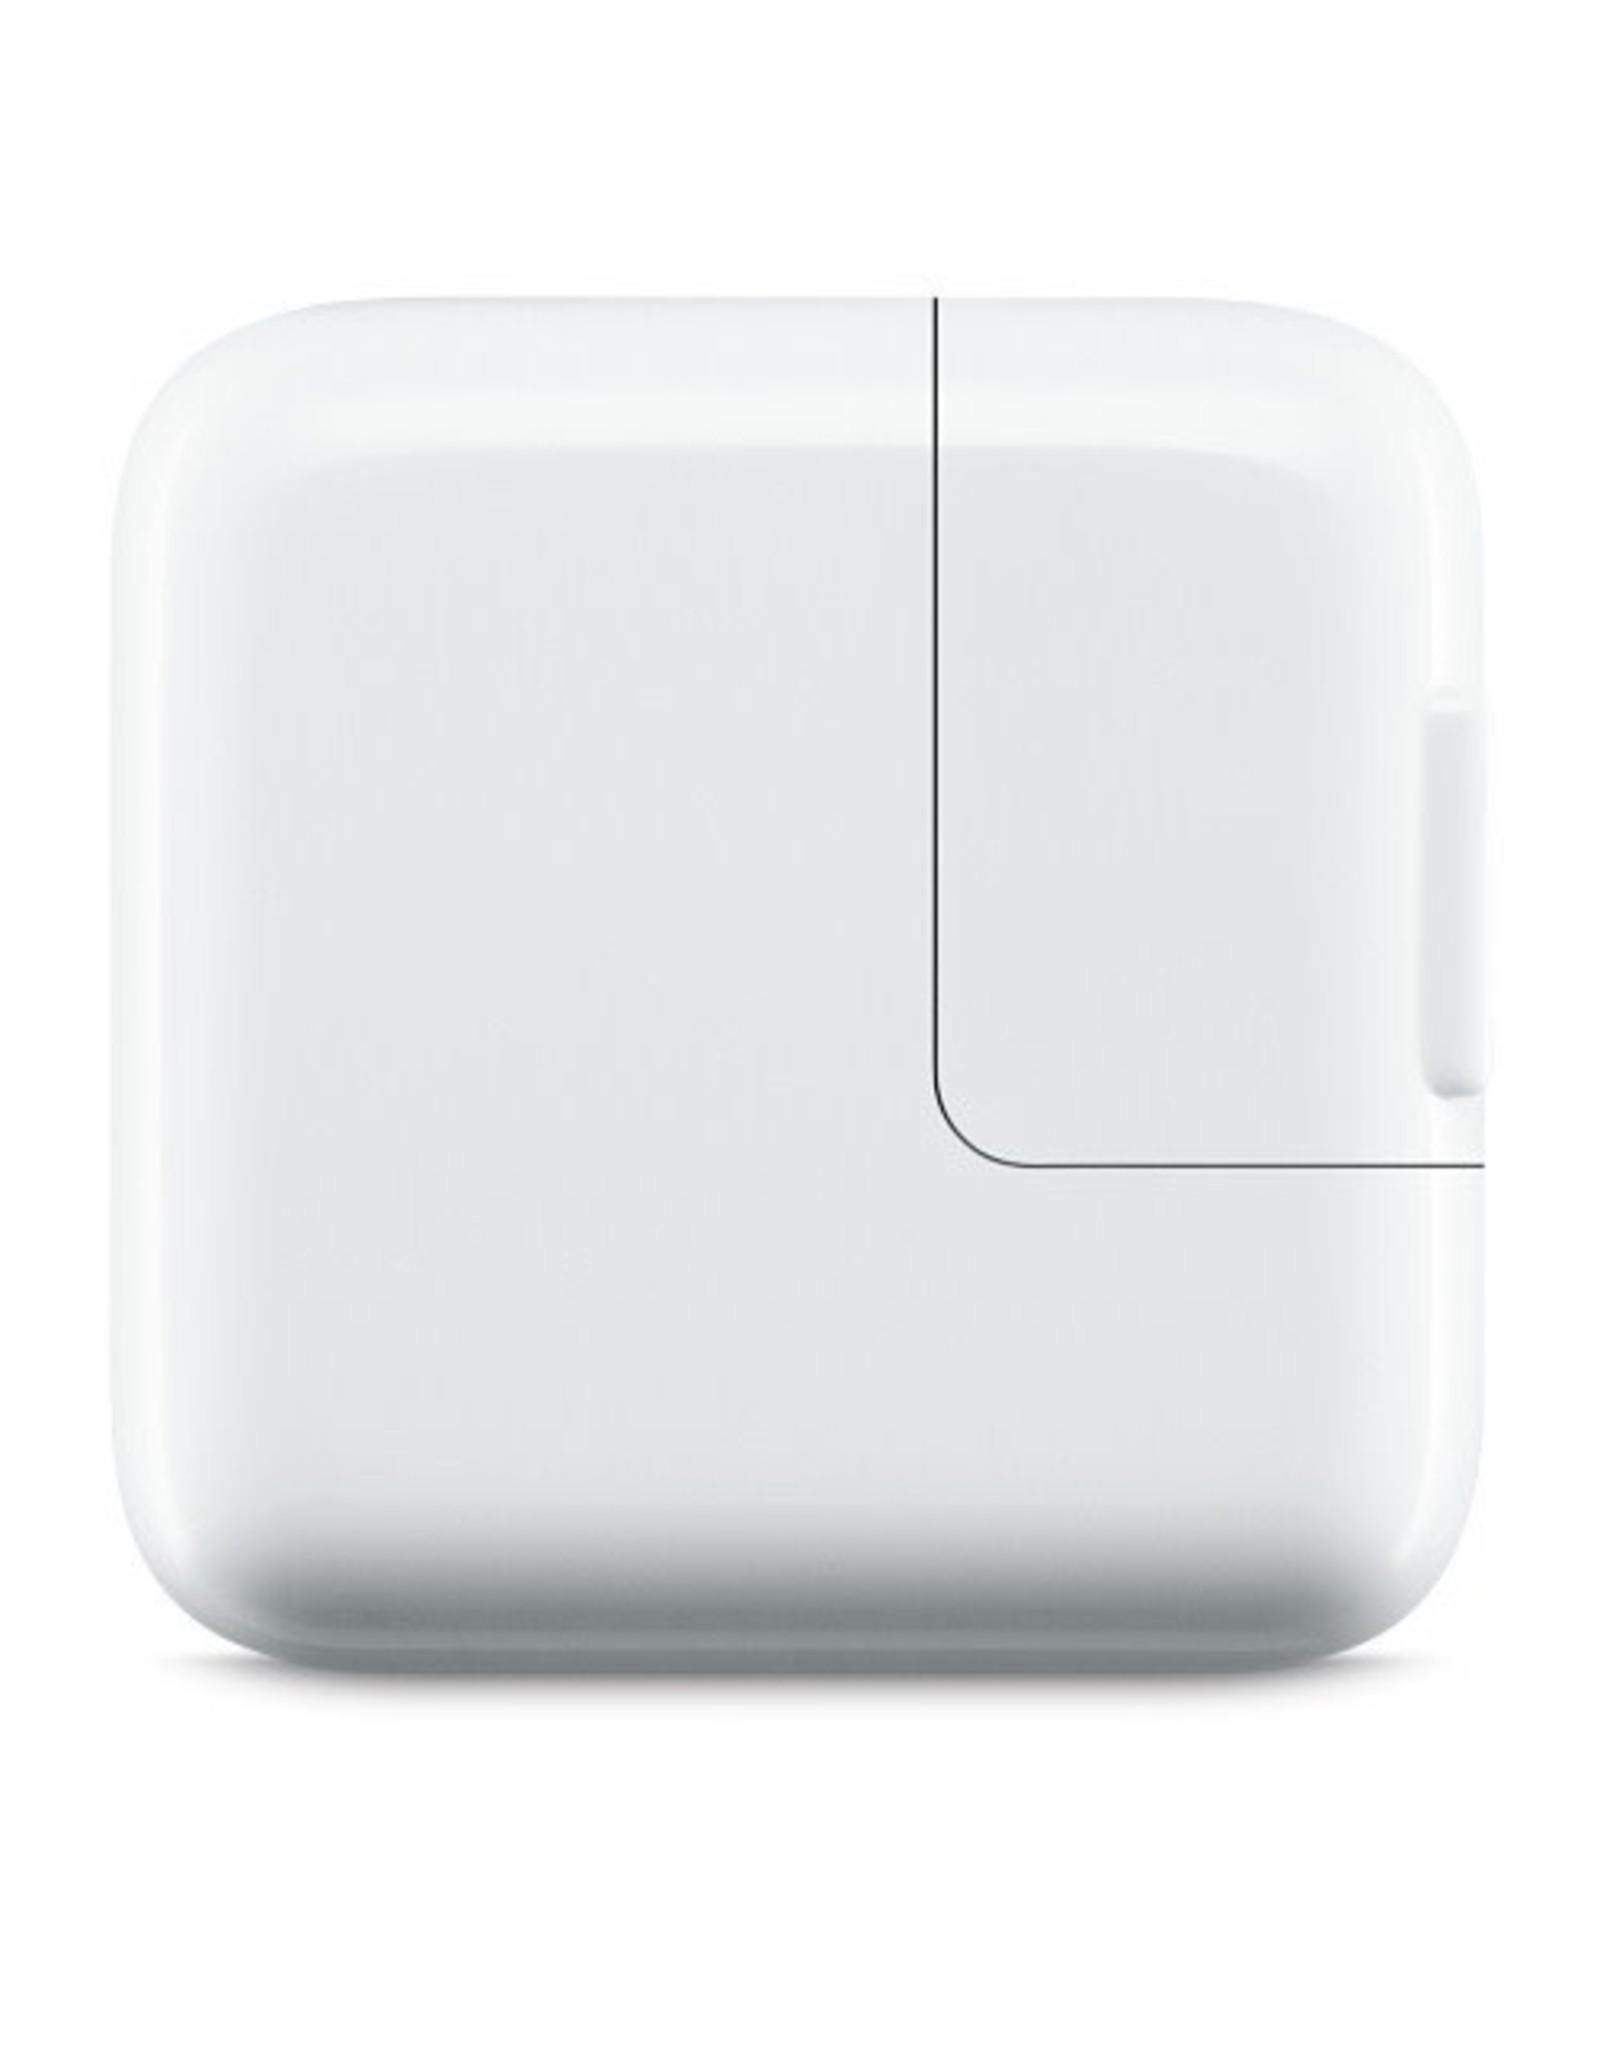 Apple Inst. Apple 12W USB Power Adapter